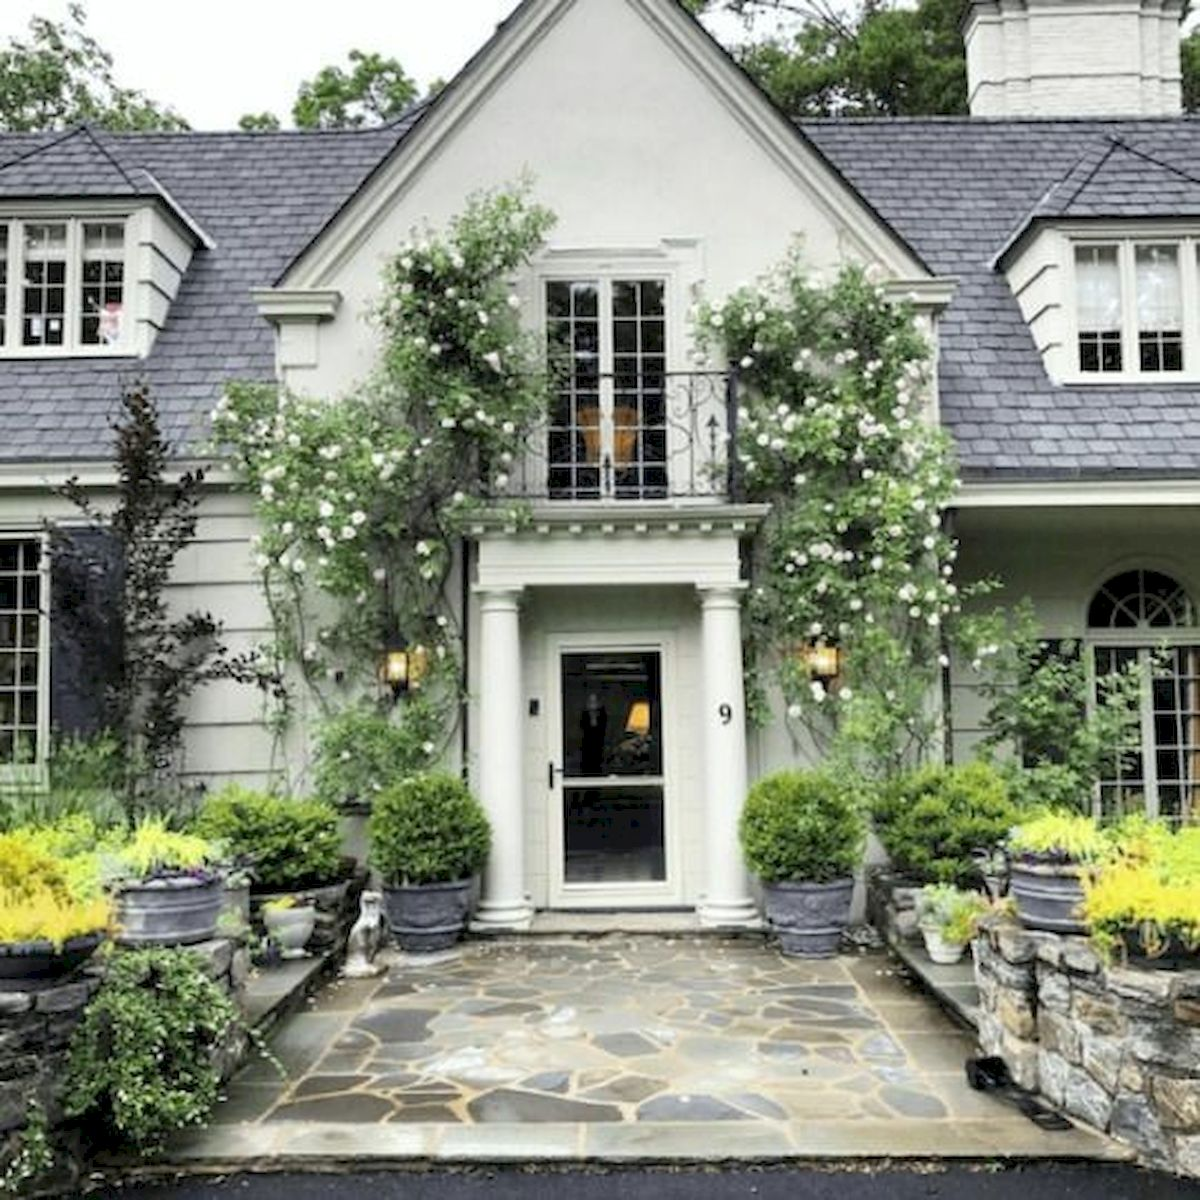 70 Stunning Exterior House Design Ideas (2)